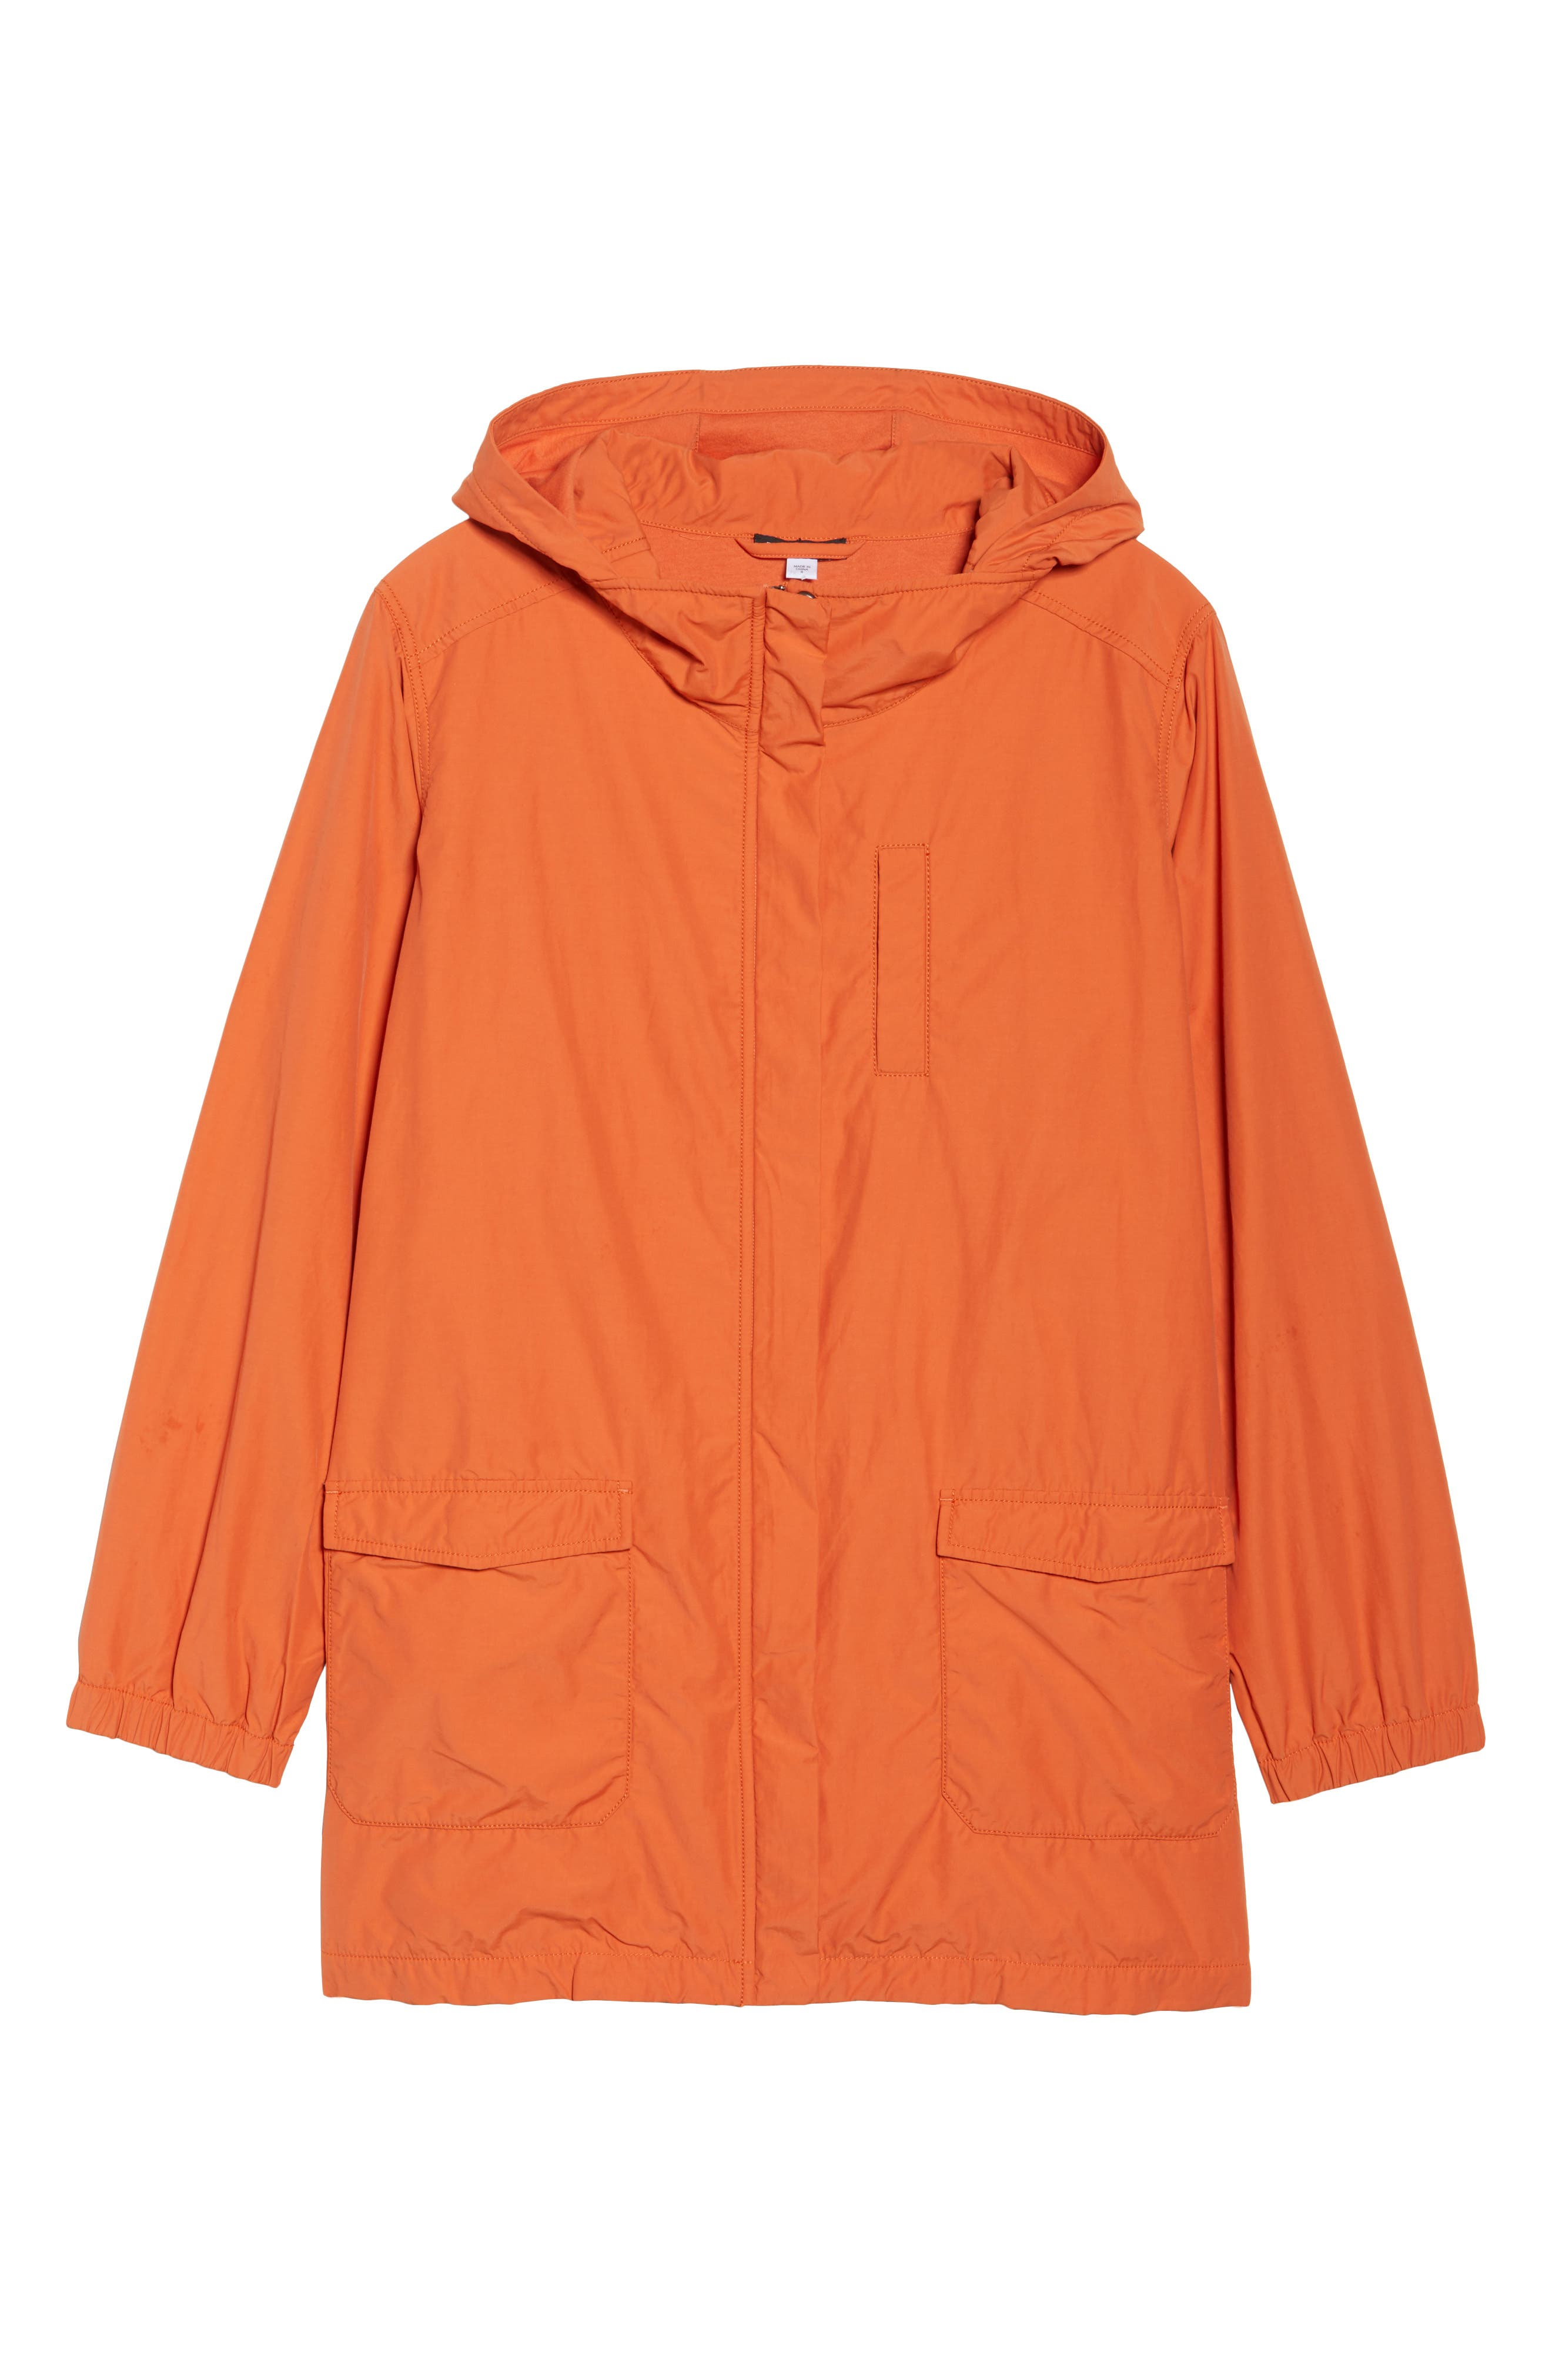 Hooded Organic Cotton Blend Jacket,                             Alternate thumbnail 6, color,                             Tiger